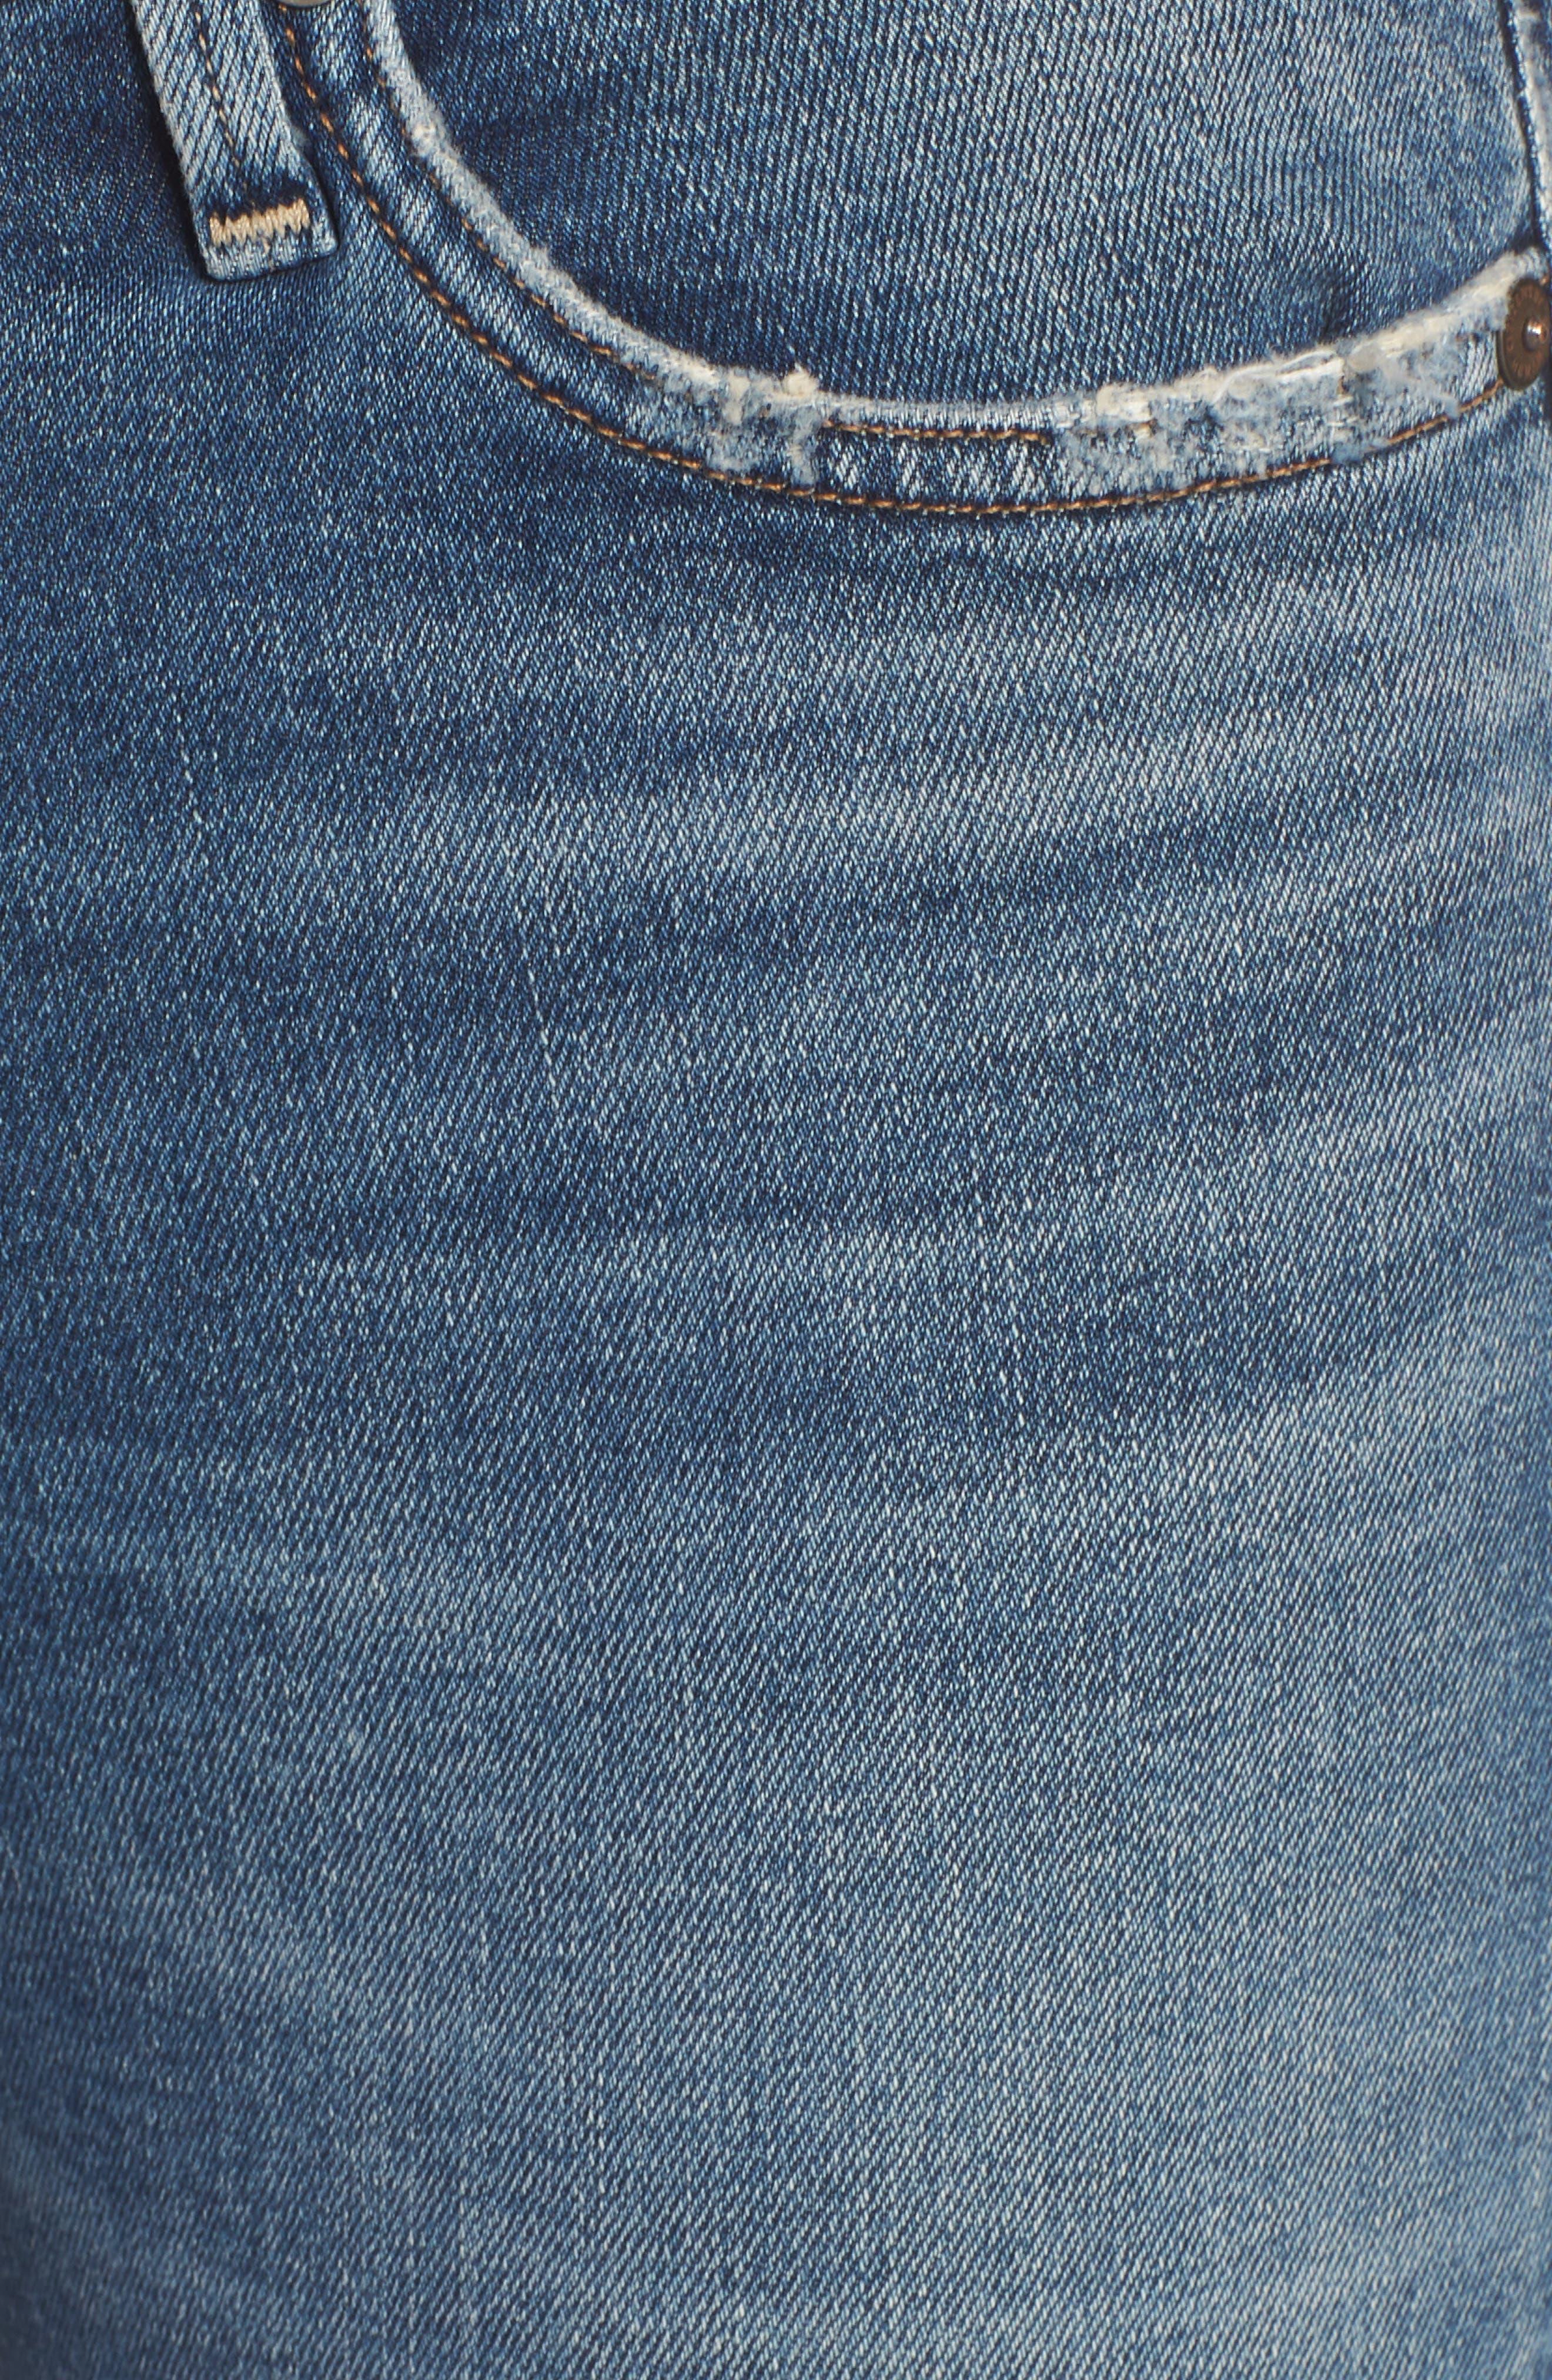 Rocket High Waist Crop Skinny Jeans,                             Alternate thumbnail 6, color,                             427